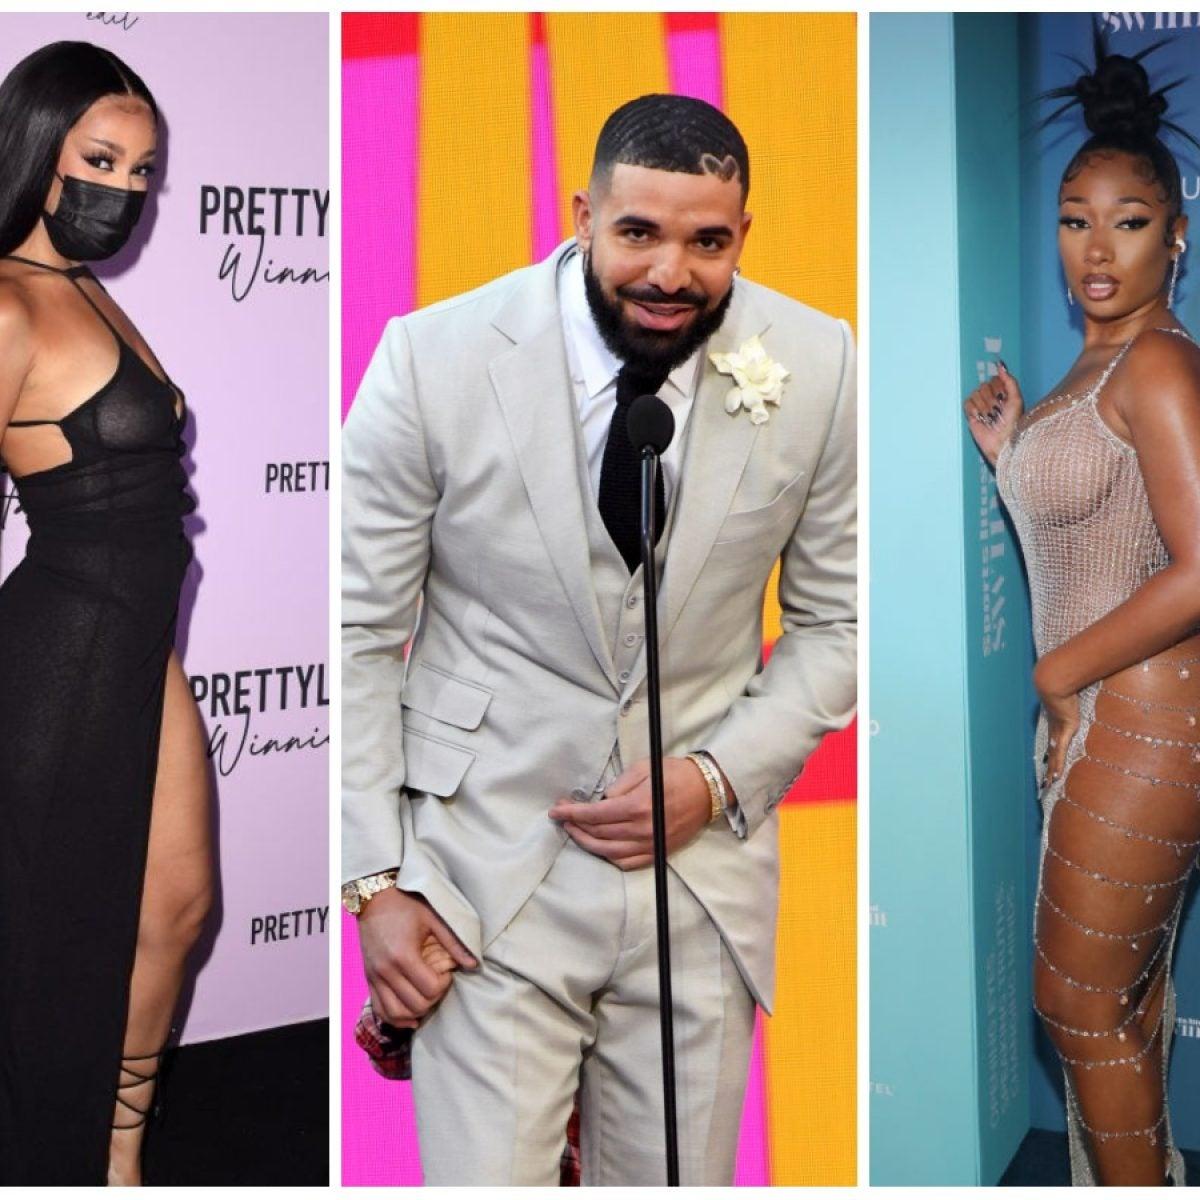 Megan Thee Stallion, Doja Cat, And Drake Earn Top MTV VMA Nominations